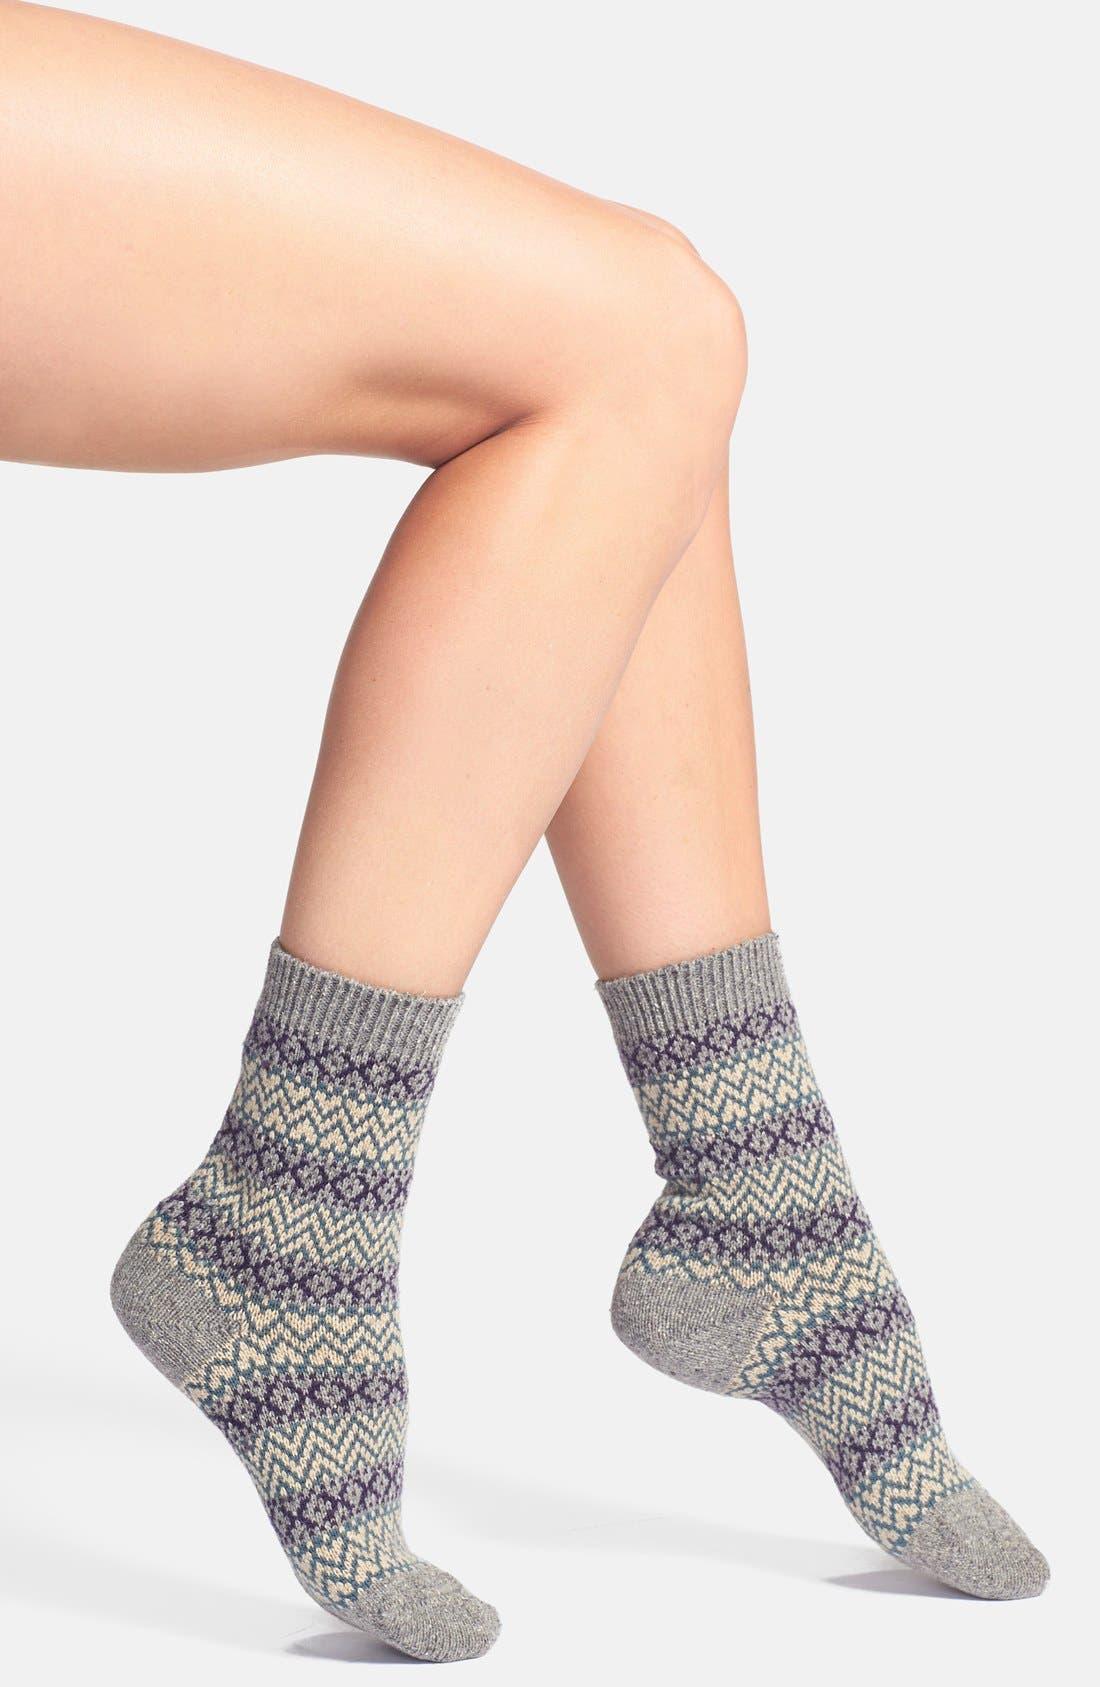 Scott-Nichol 'Rosedale Fair Isle' Wool Blend Socks,                         Main,                         color, 026